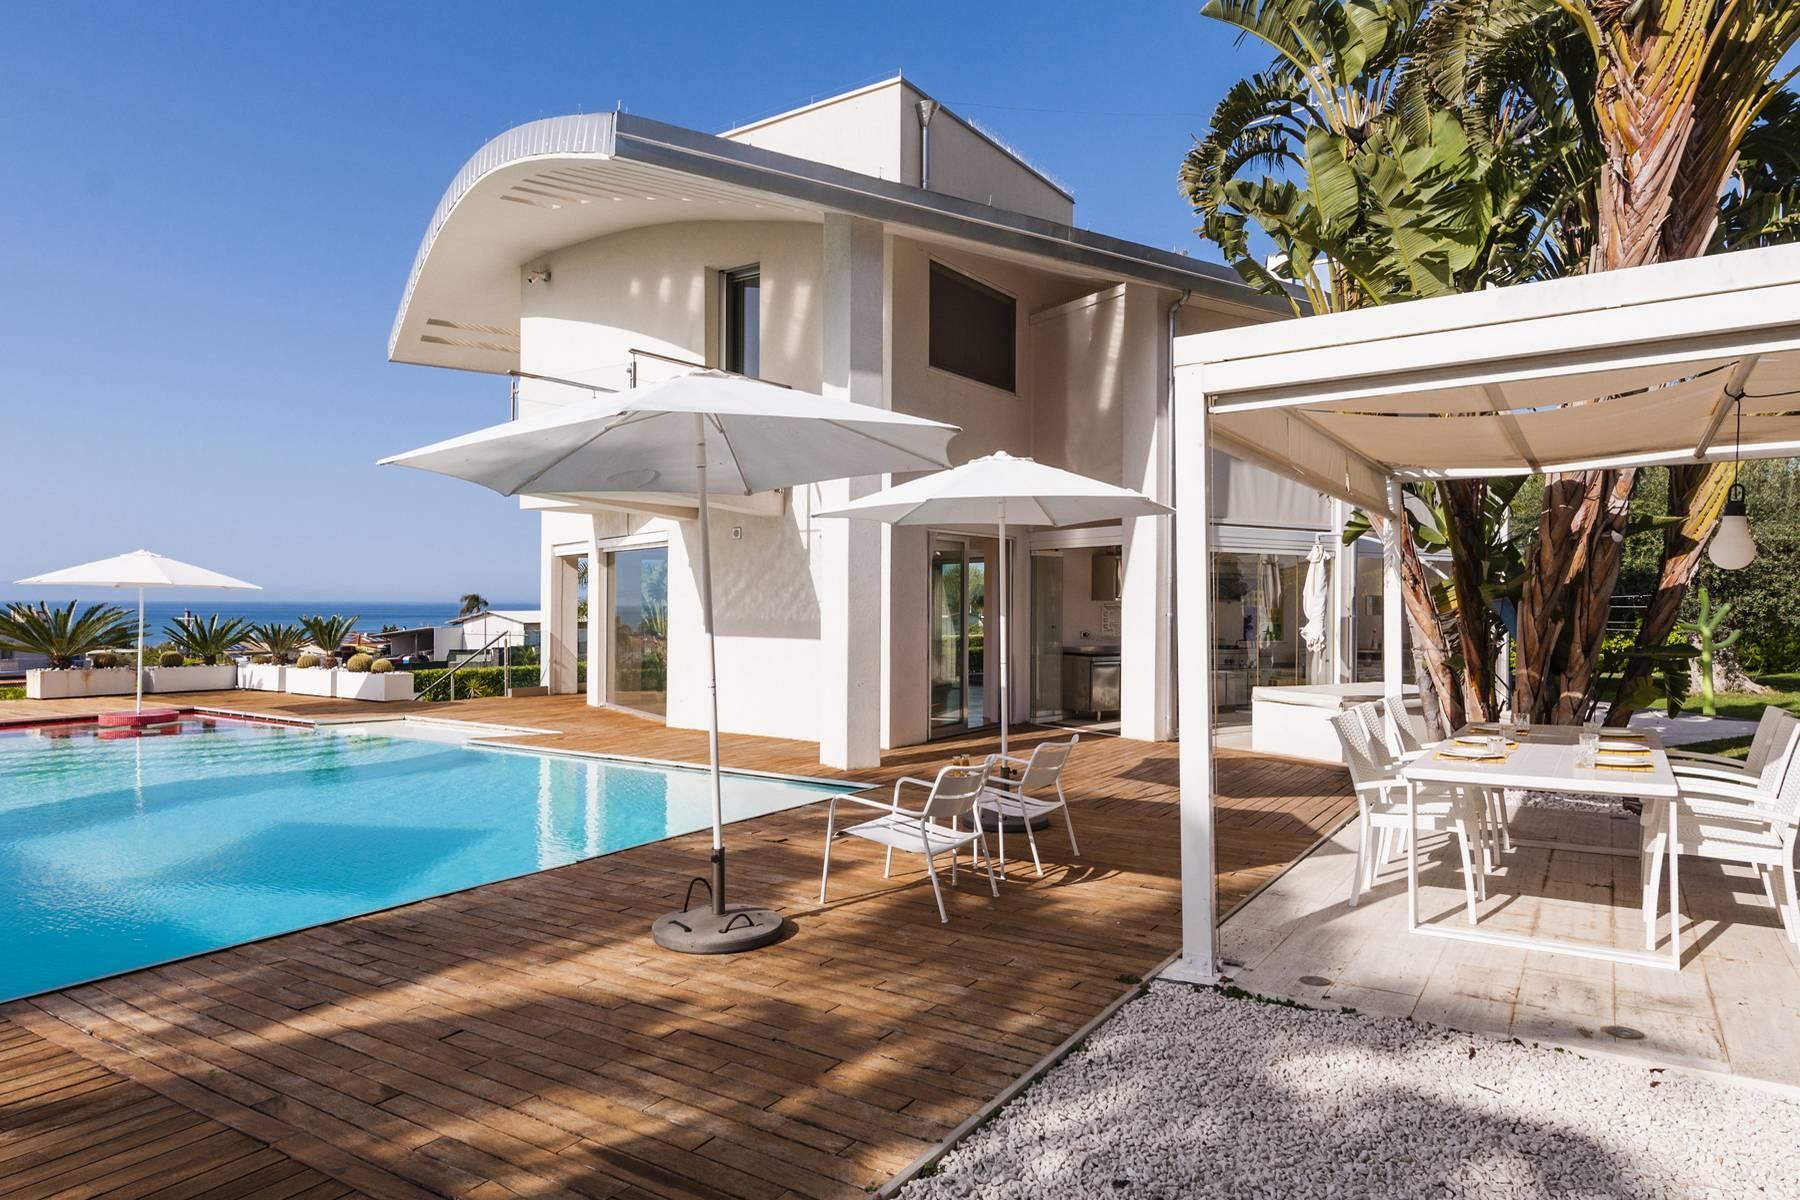 Villa con piscina a Brucoli - 10